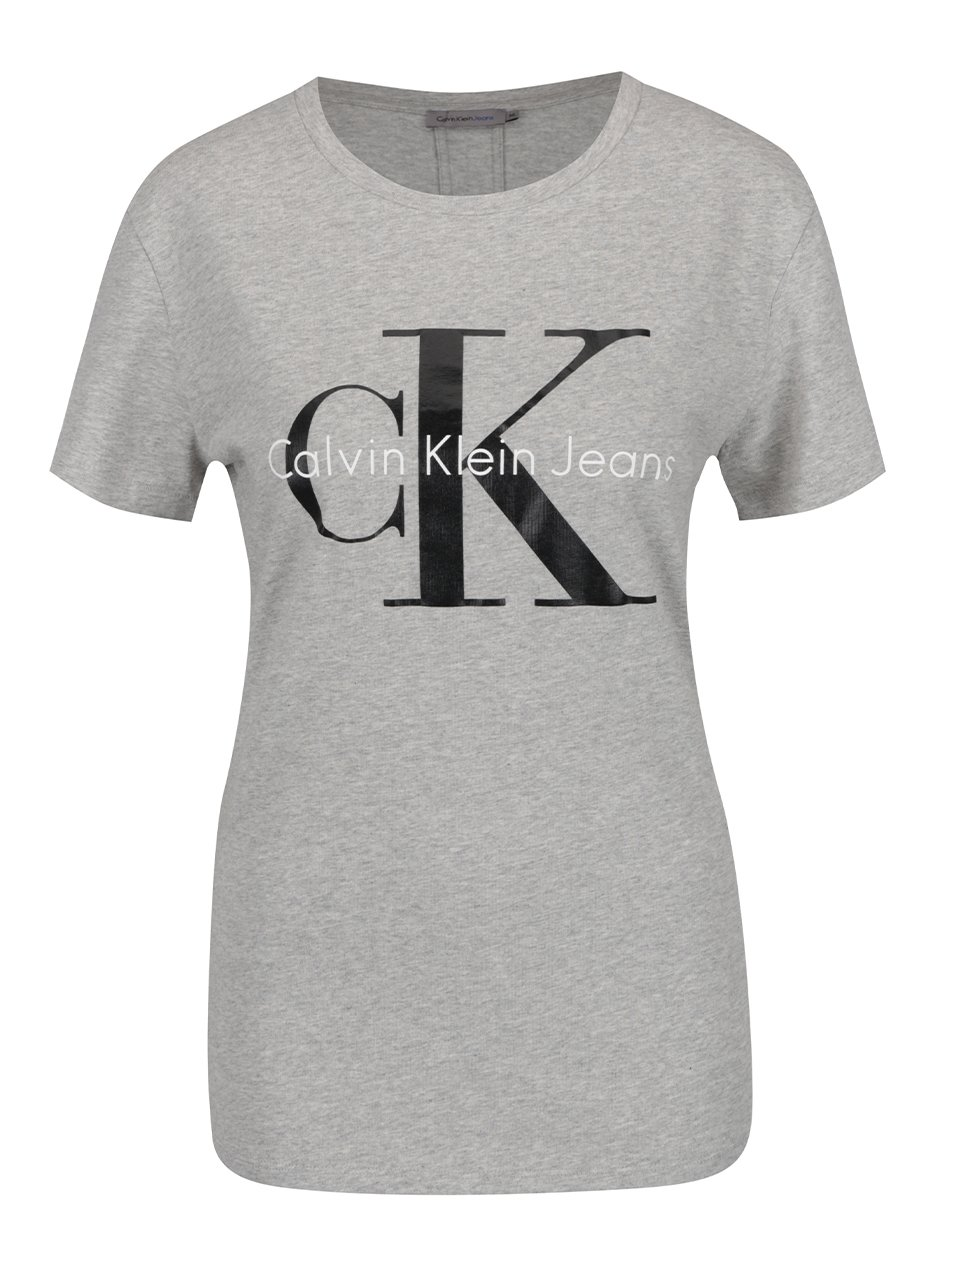 a3657fdb3 Svetlosivé dámske tričko Calvin Klein Jeans Shrunken   Moda.sk